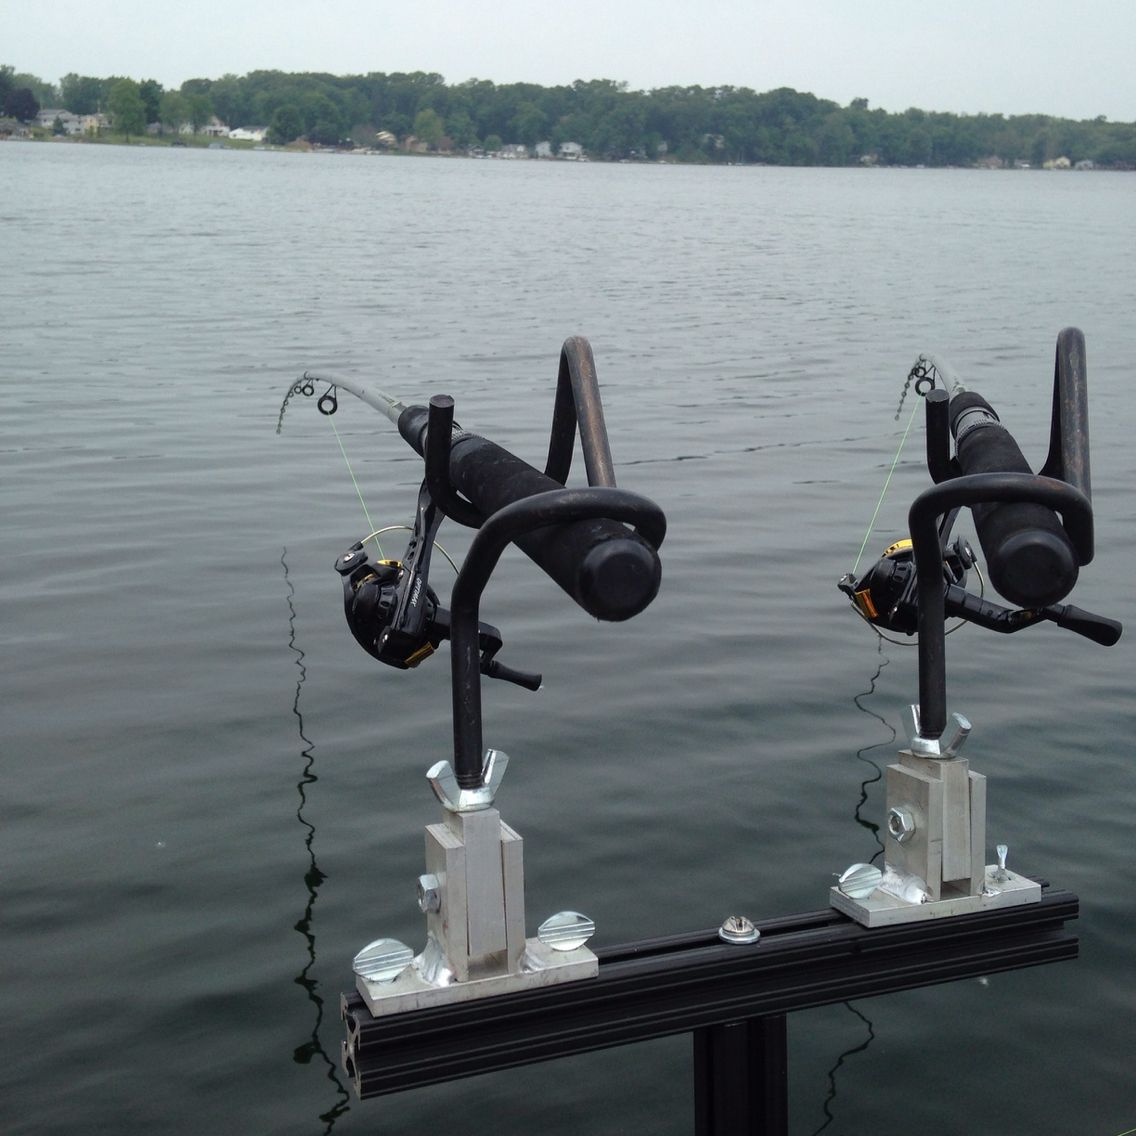 2 rod holder spider rig setup mini t bar for crappie for Spider rigs for crappie fishing